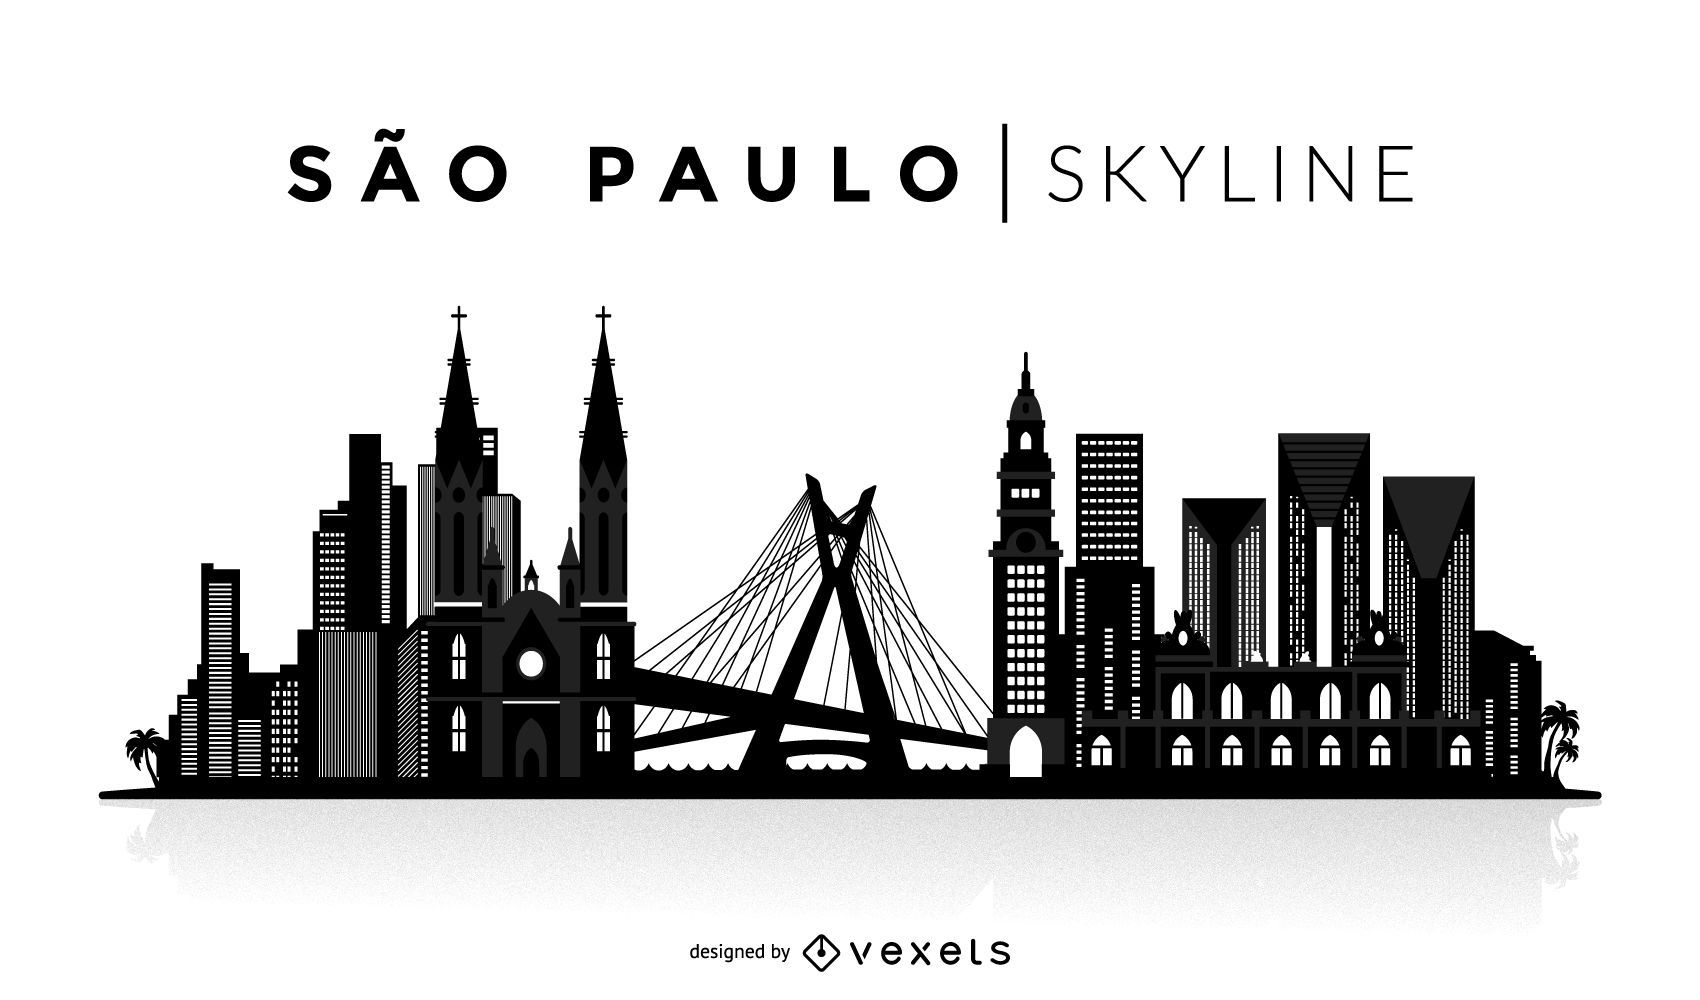 Skyline-Silhouette von Sao Paulo